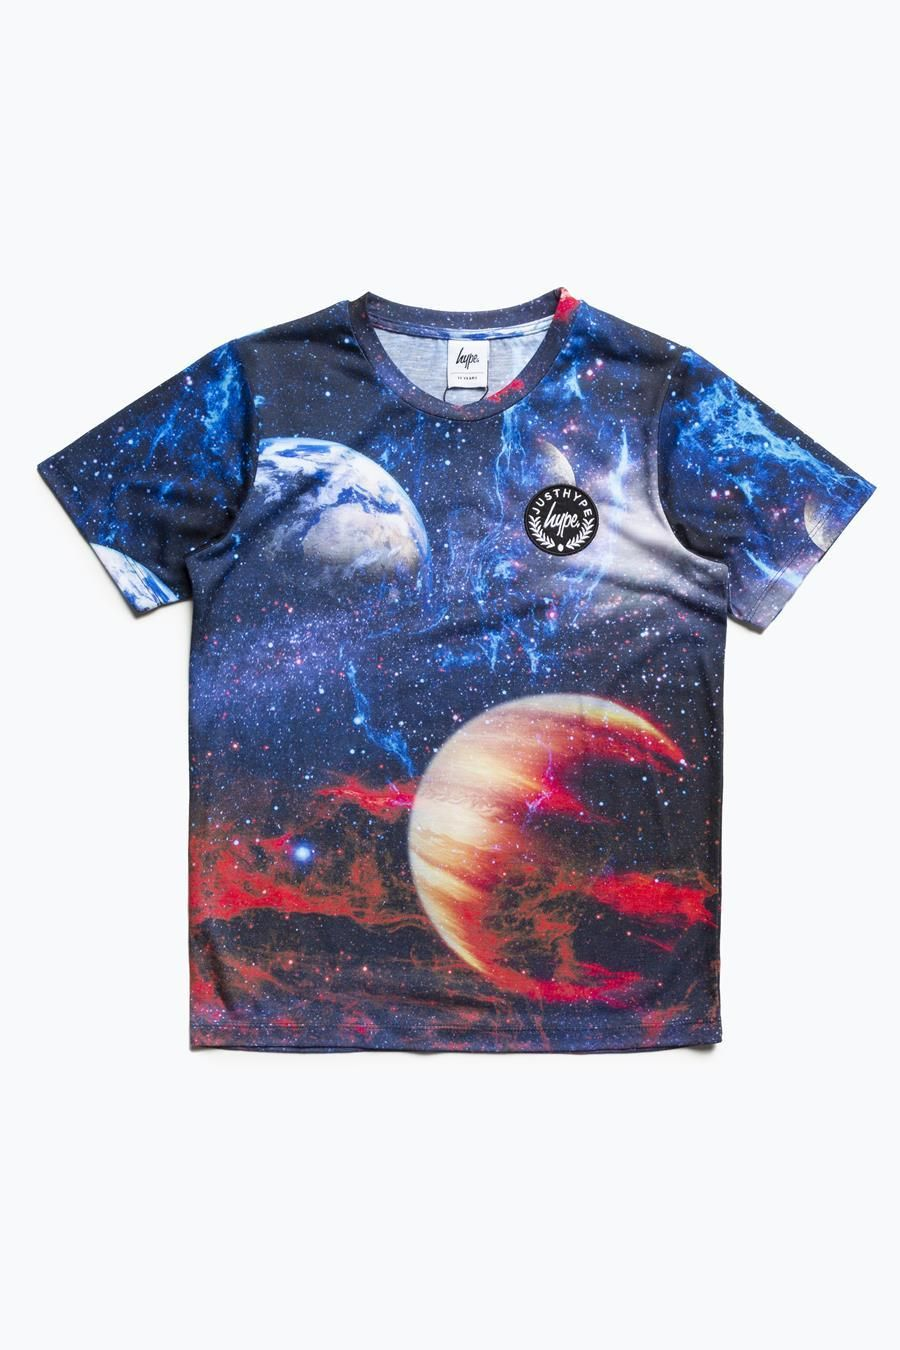 Hype Sunburst Kids T-Shirt